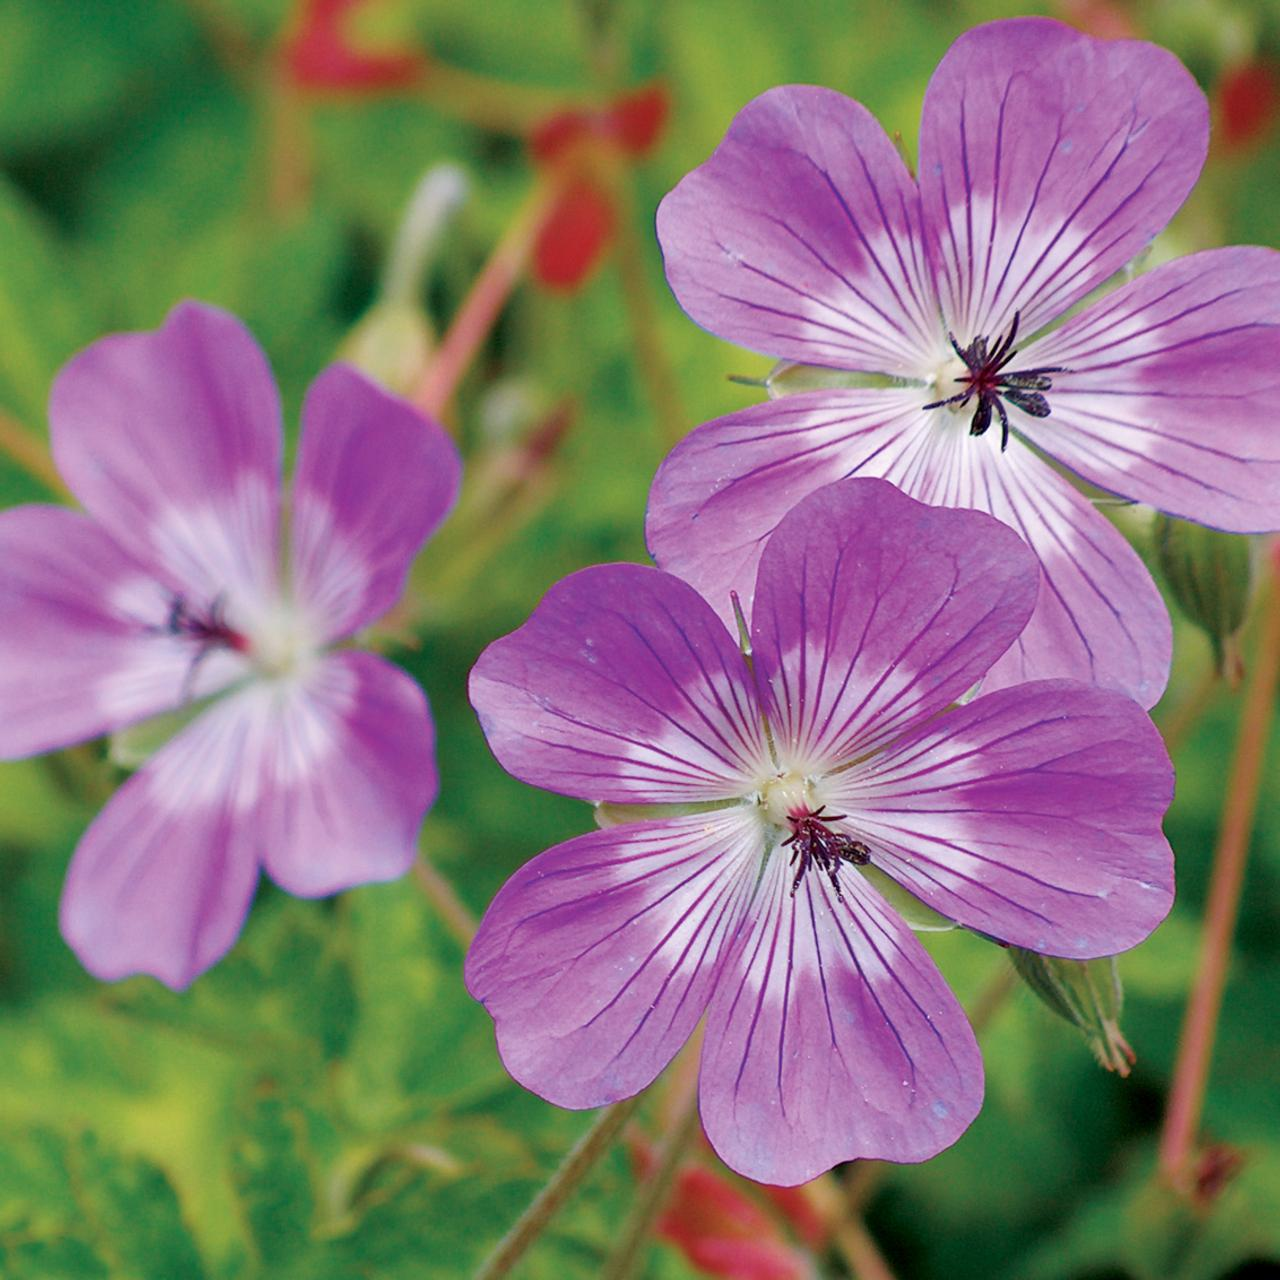 Geranium 'Sylvia's Surprise' plant